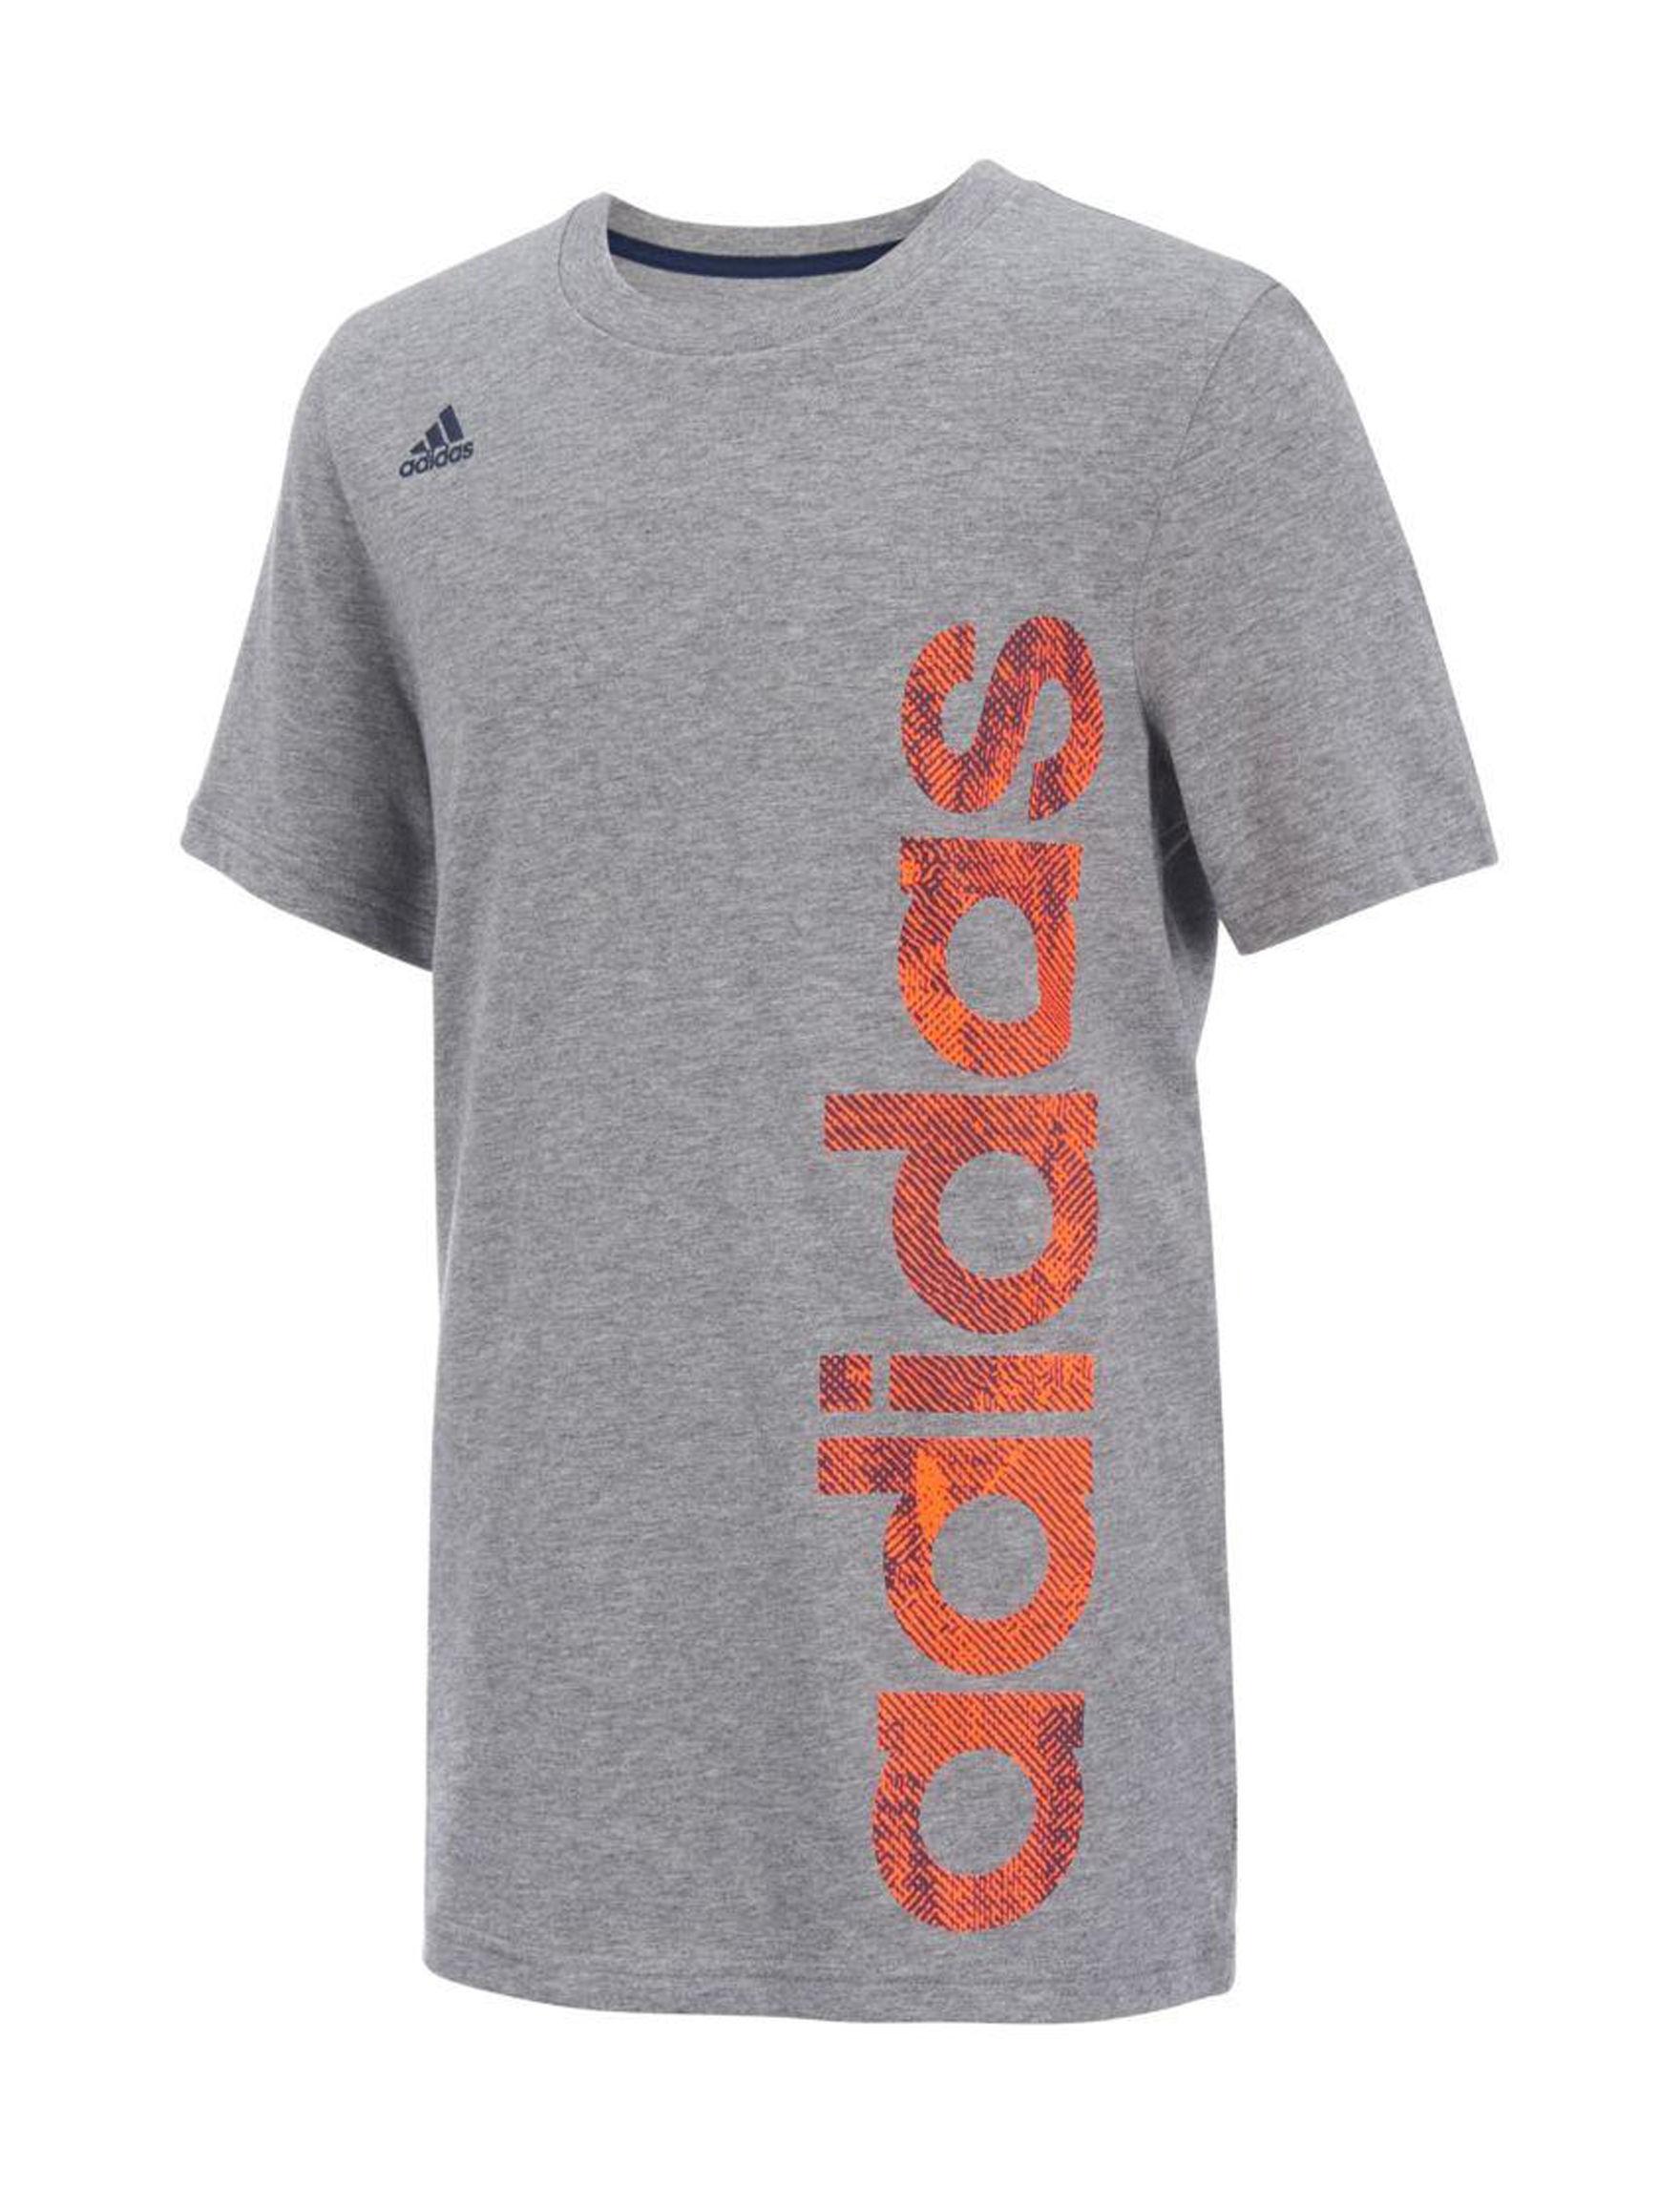 Adidas Grey / Red Tees & Tanks